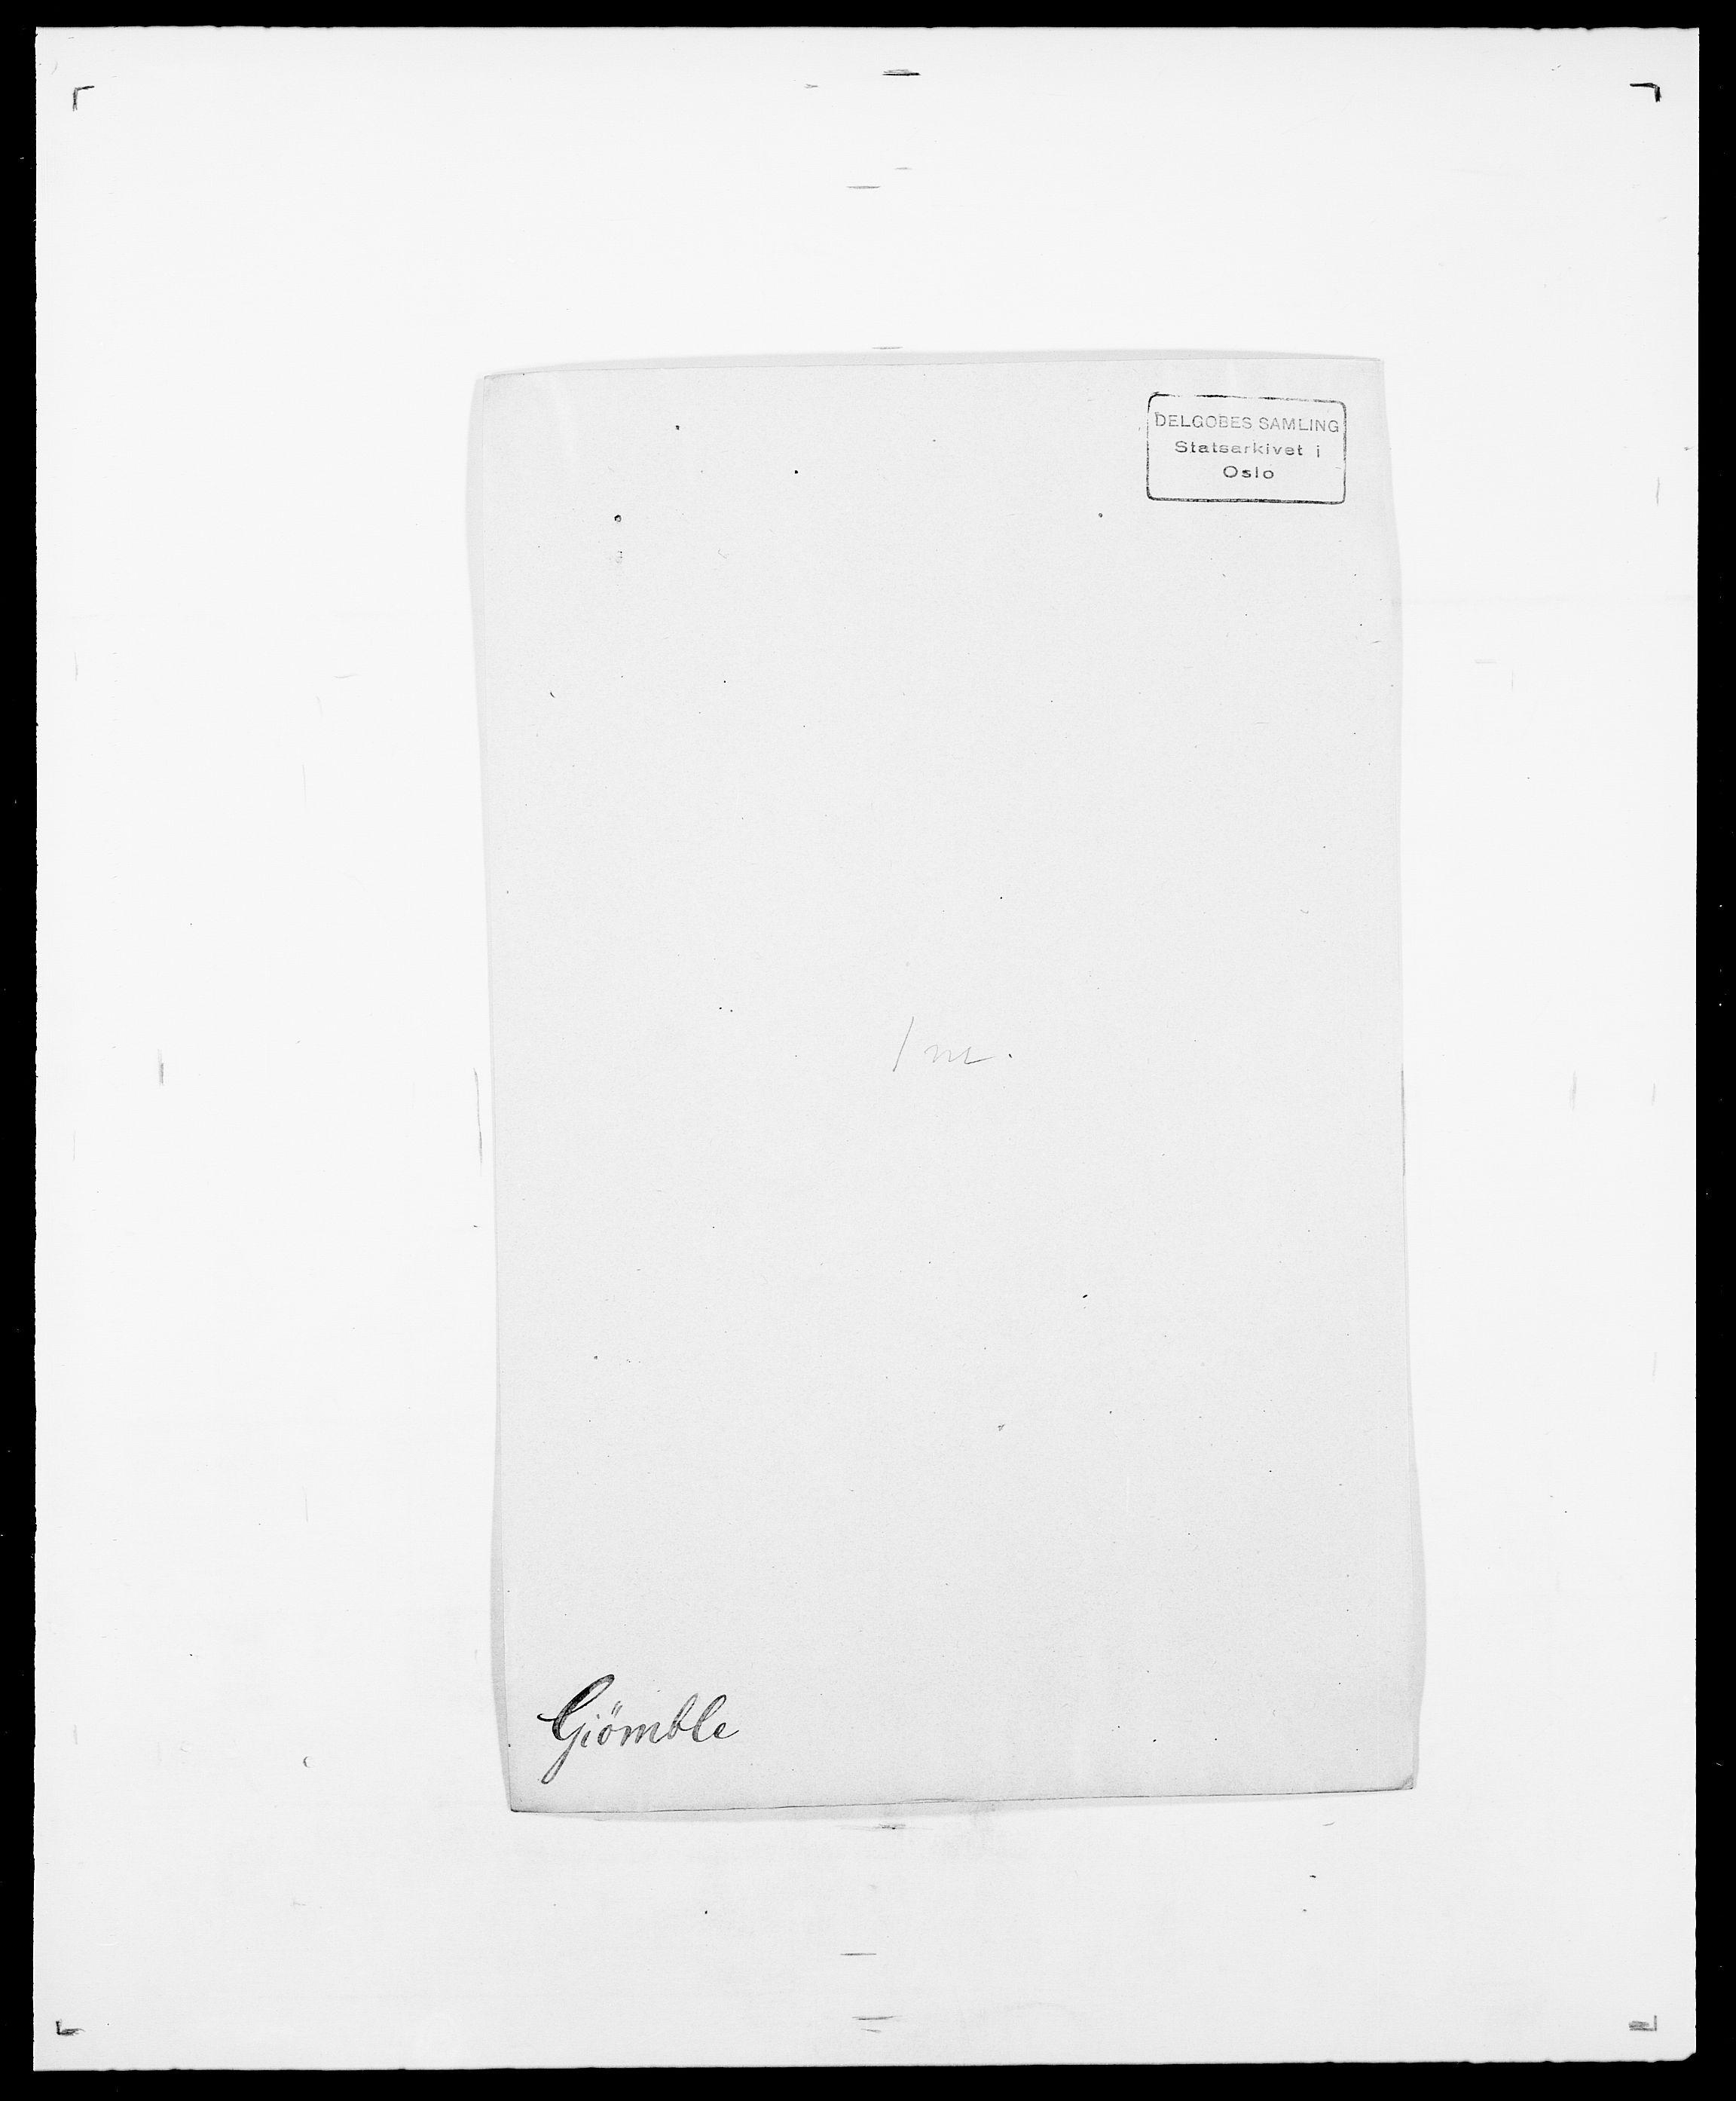 SAO, Delgobe, Charles Antoine - samling, D/Da/L0014: Giebdhausen - Grip, s. 65